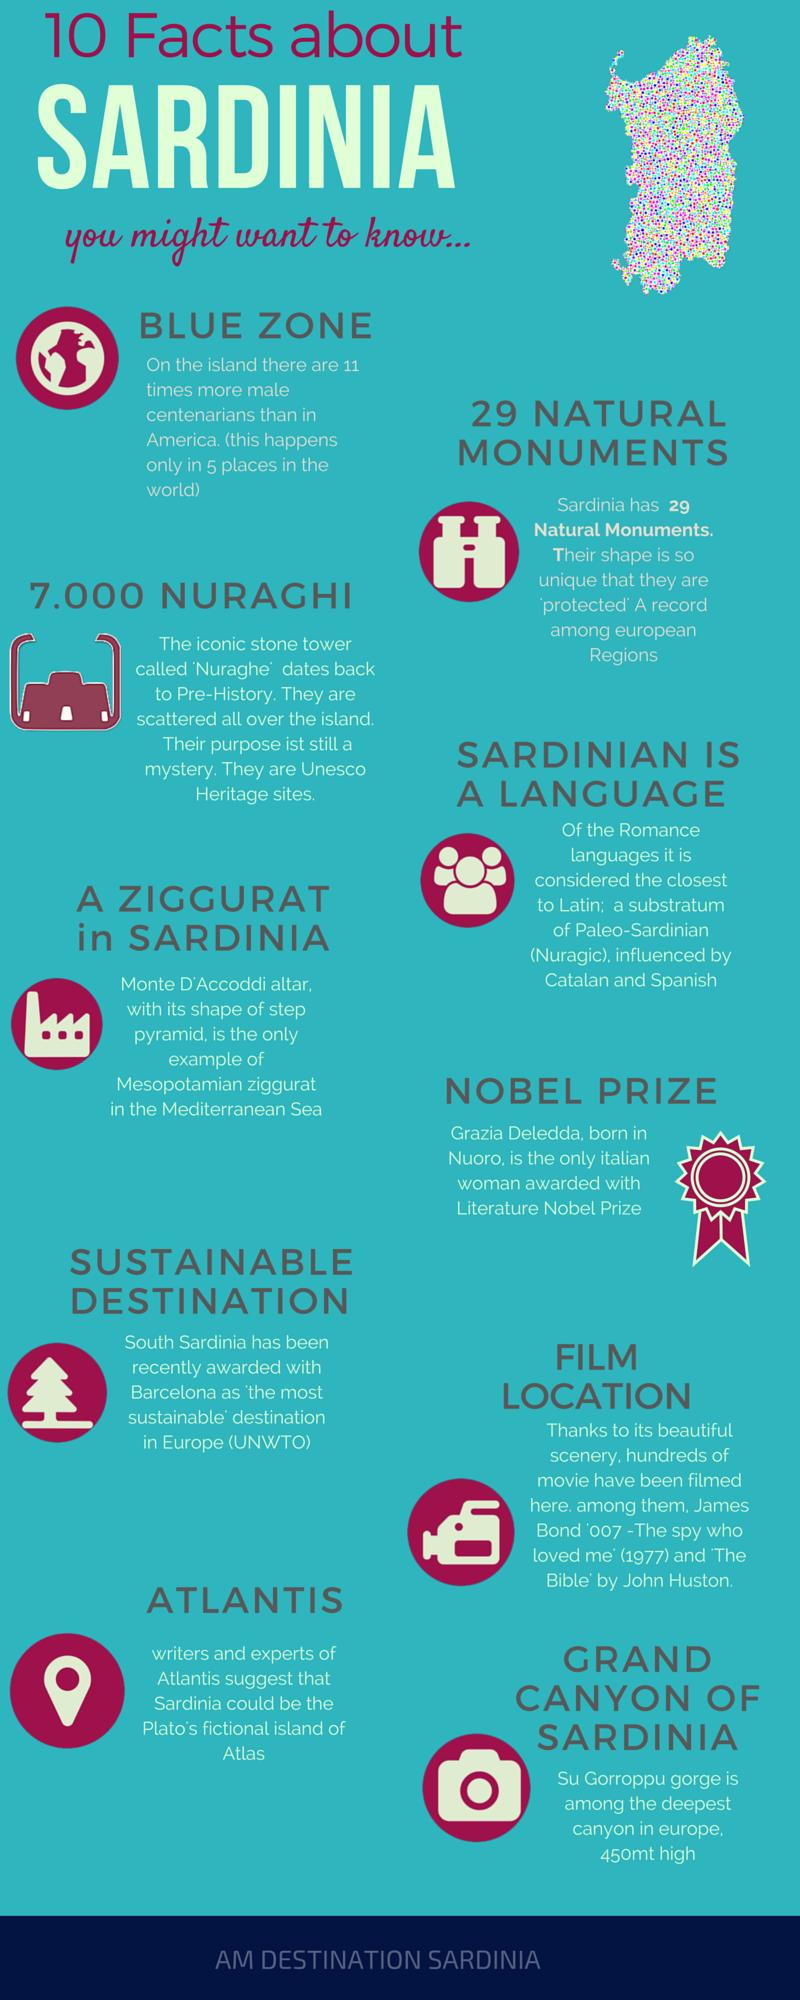 Sardinia 10 interesting facts